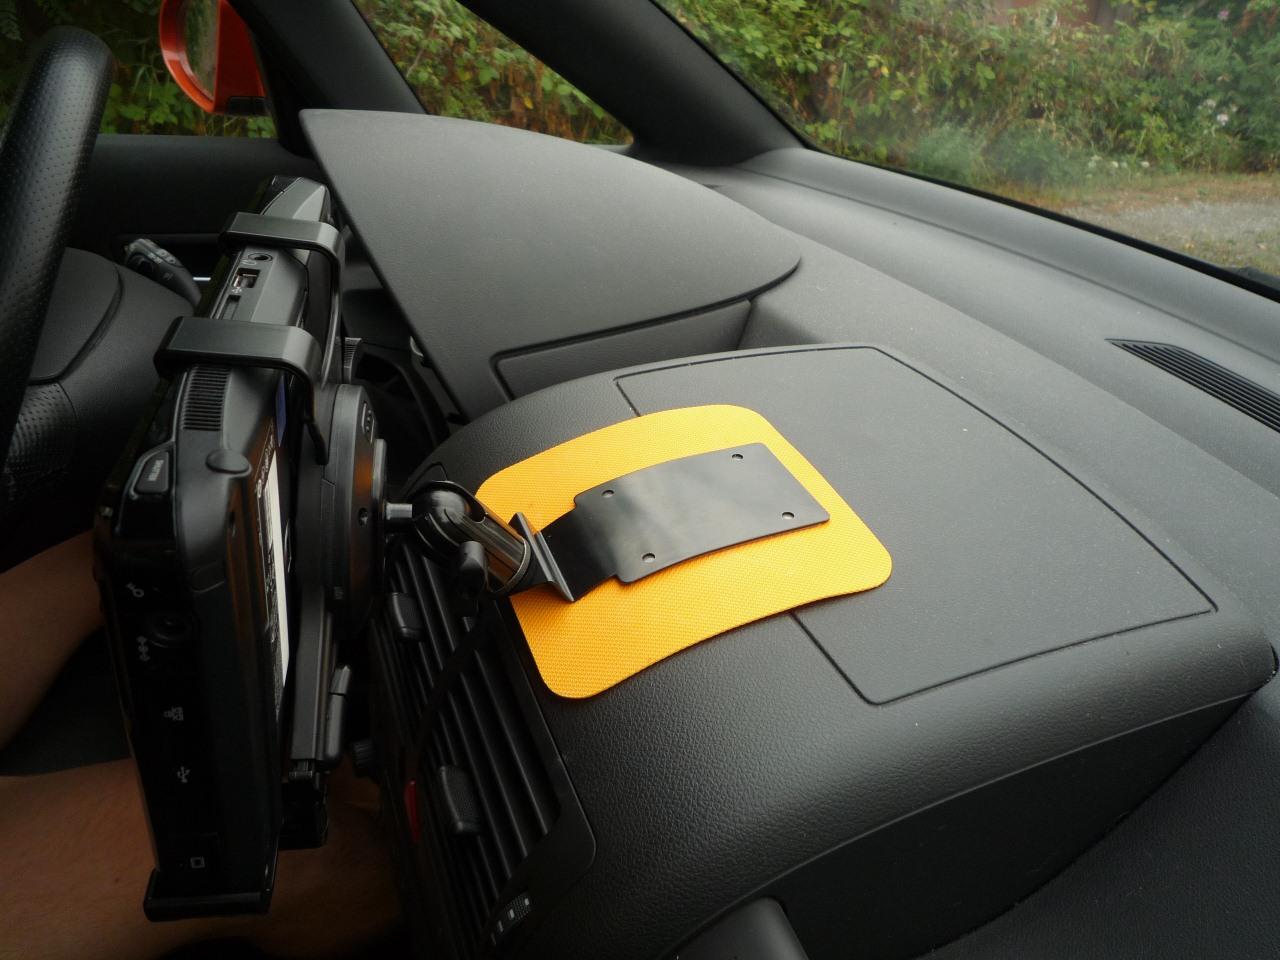 CAR-UMPC-Projekt_Haltertest2.JPG.3b16c919256eb36aba4bcf7771fbb70f.JPG